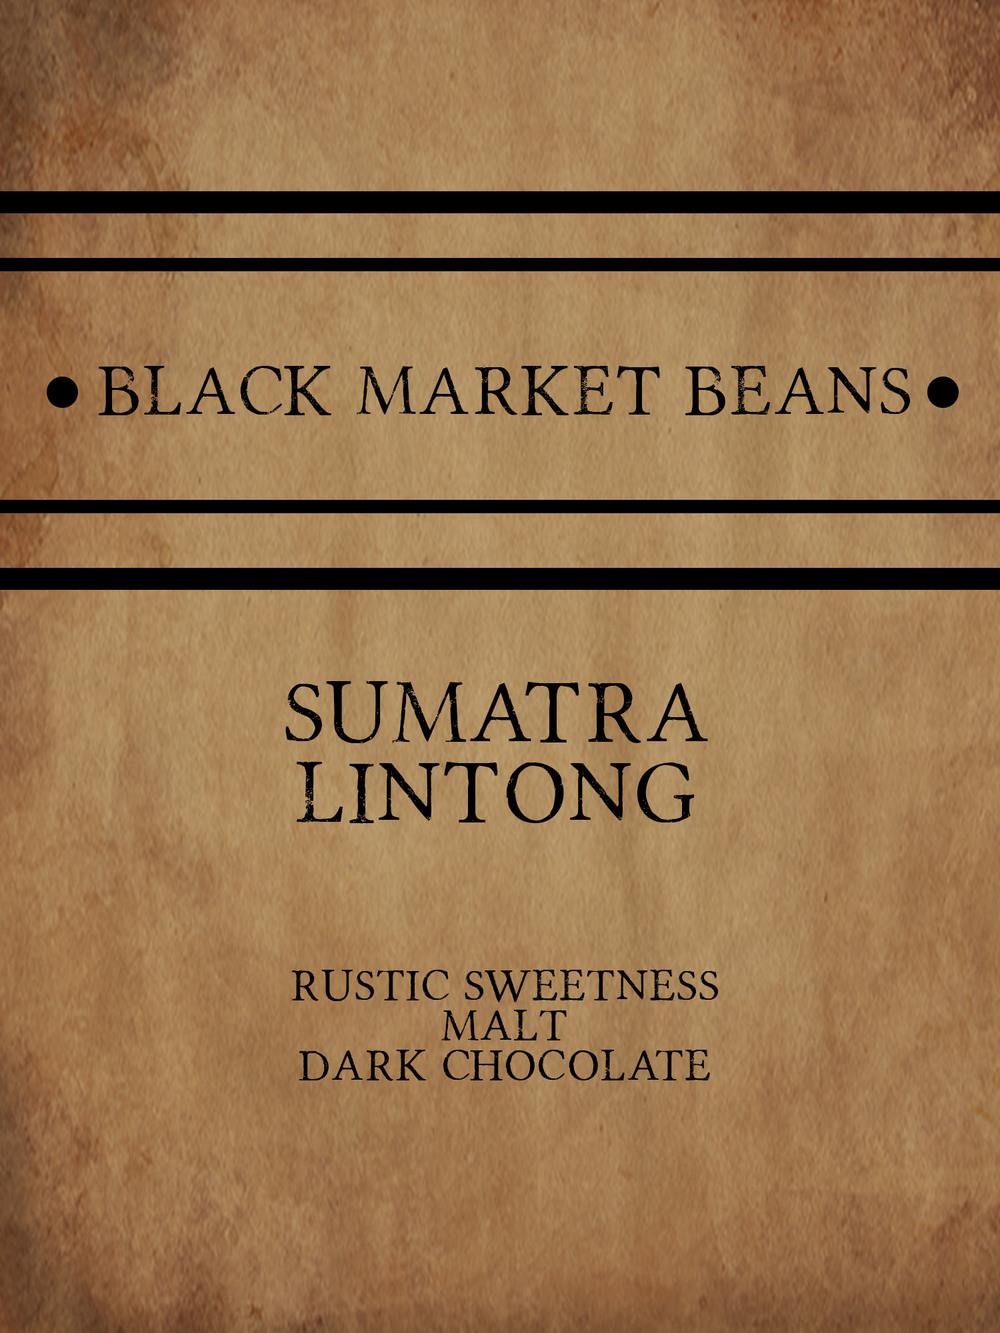 coffee_Sumatra_lintong.jpg